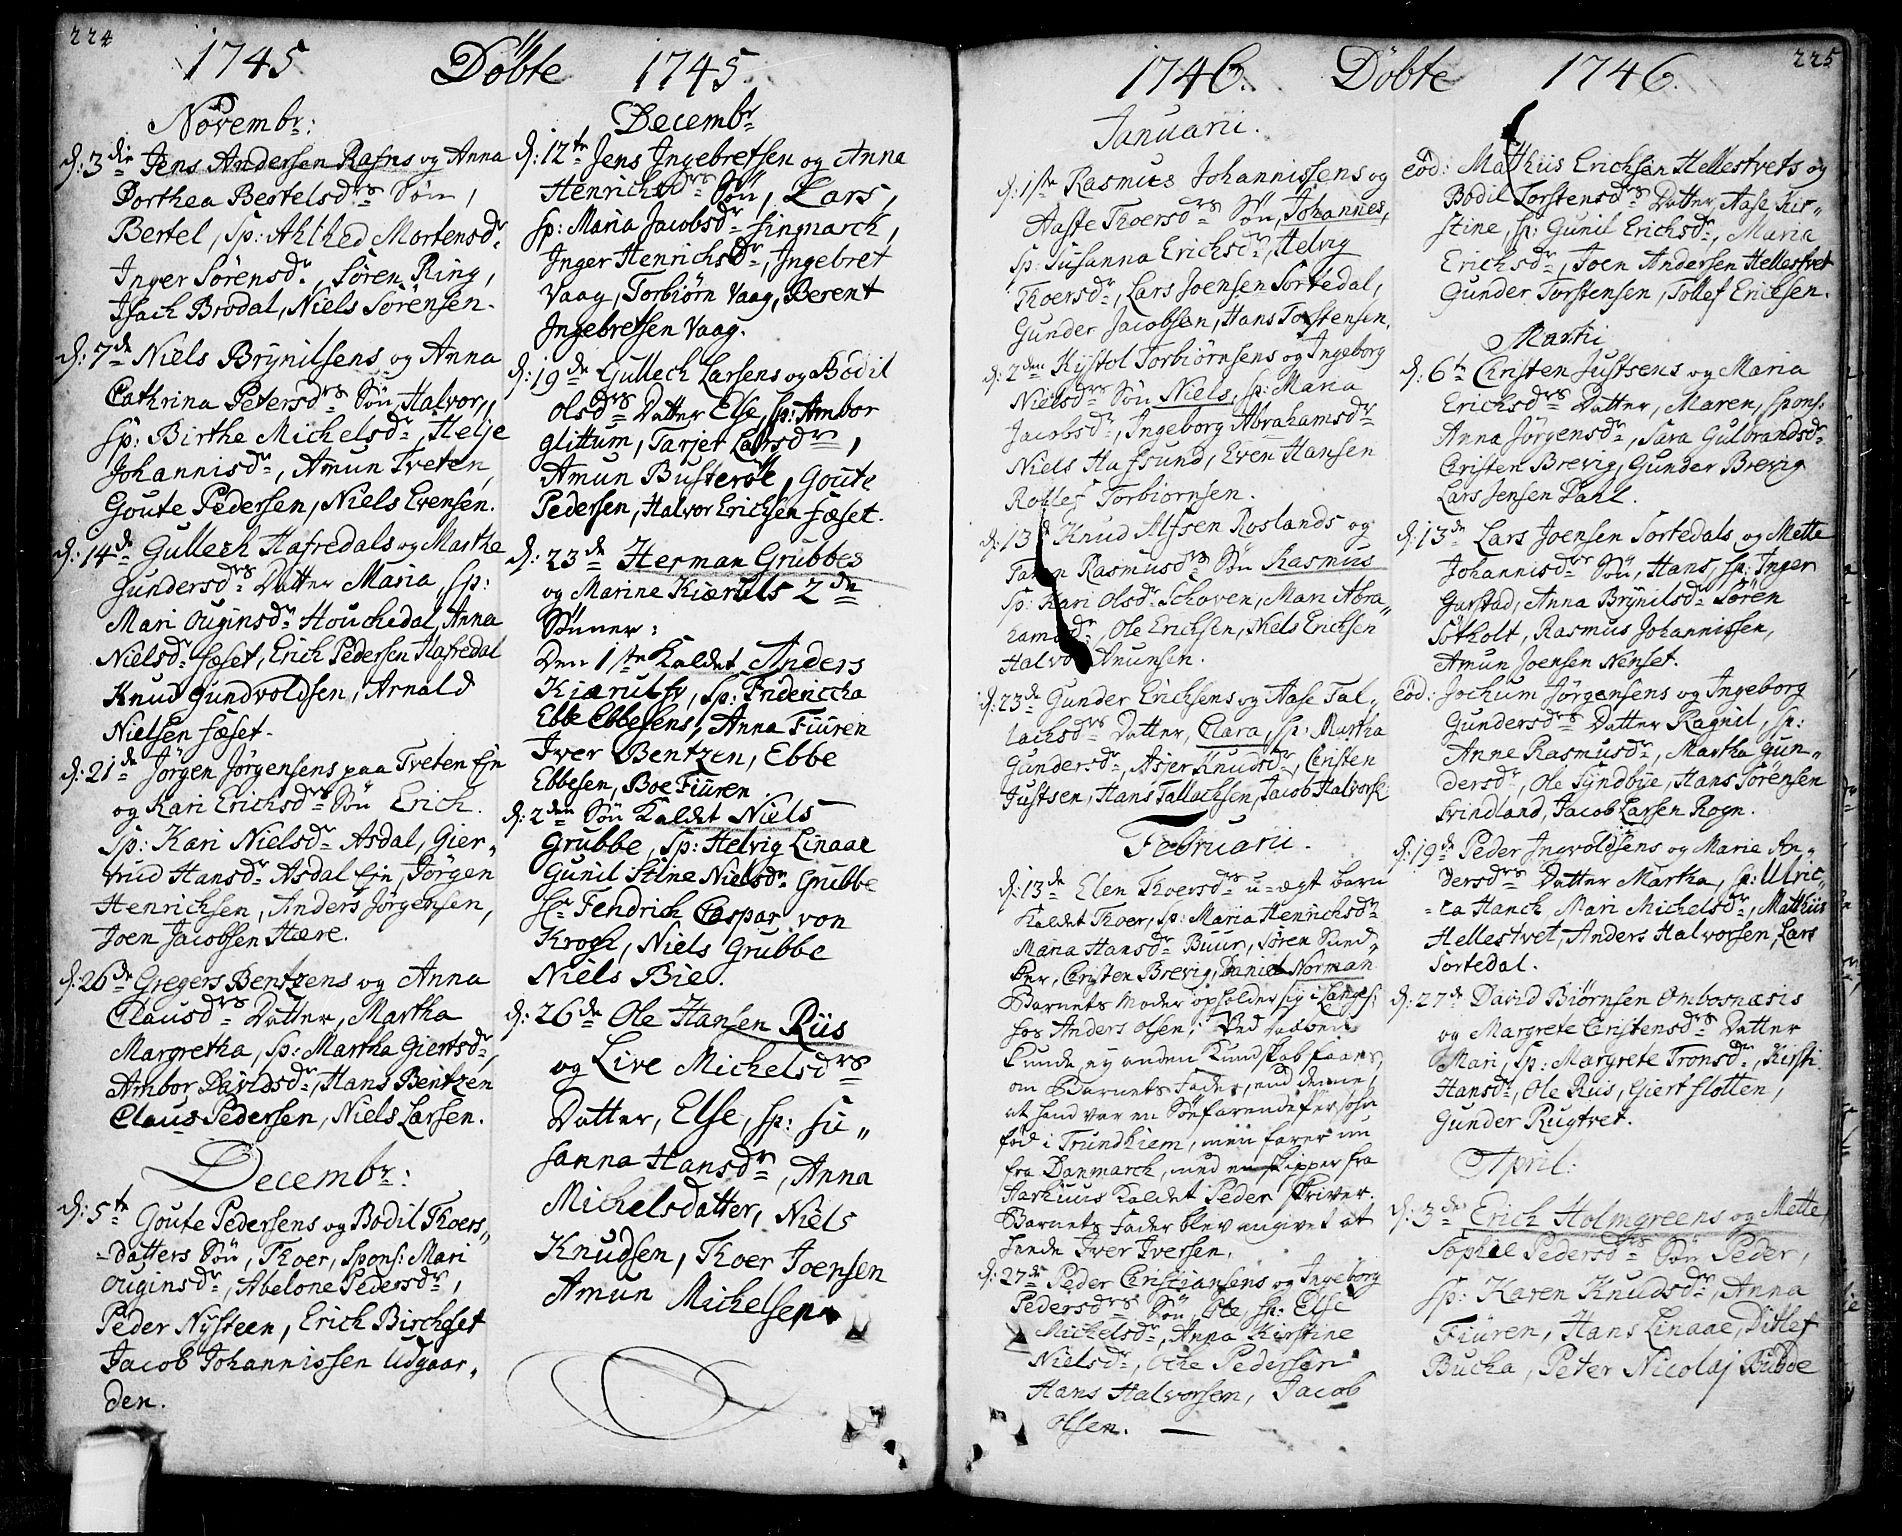 SAKO, Bamble kirkebøker, F/Fa/L0001: Ministerialbok nr. I 1, 1702-1774, s. 224-225